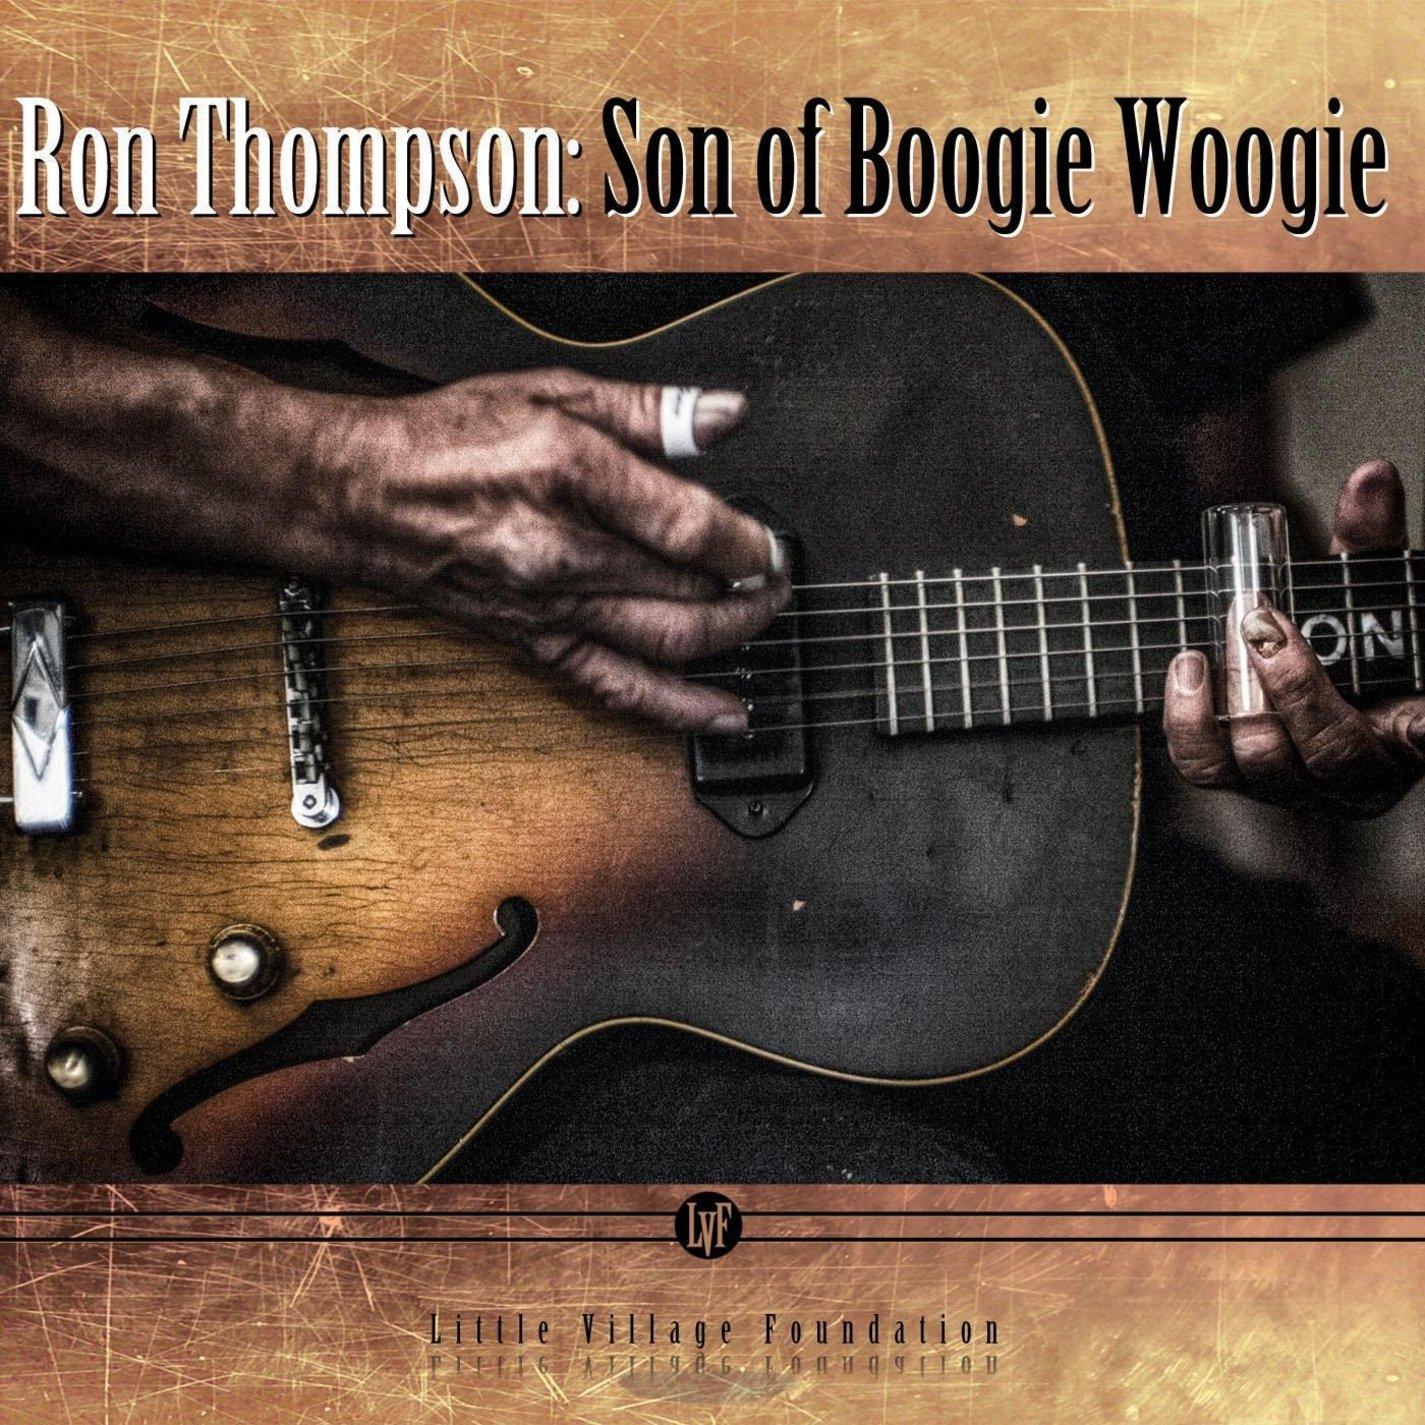 Son of Boogie Woogie: Ron Thompson: Amazon.es: Música